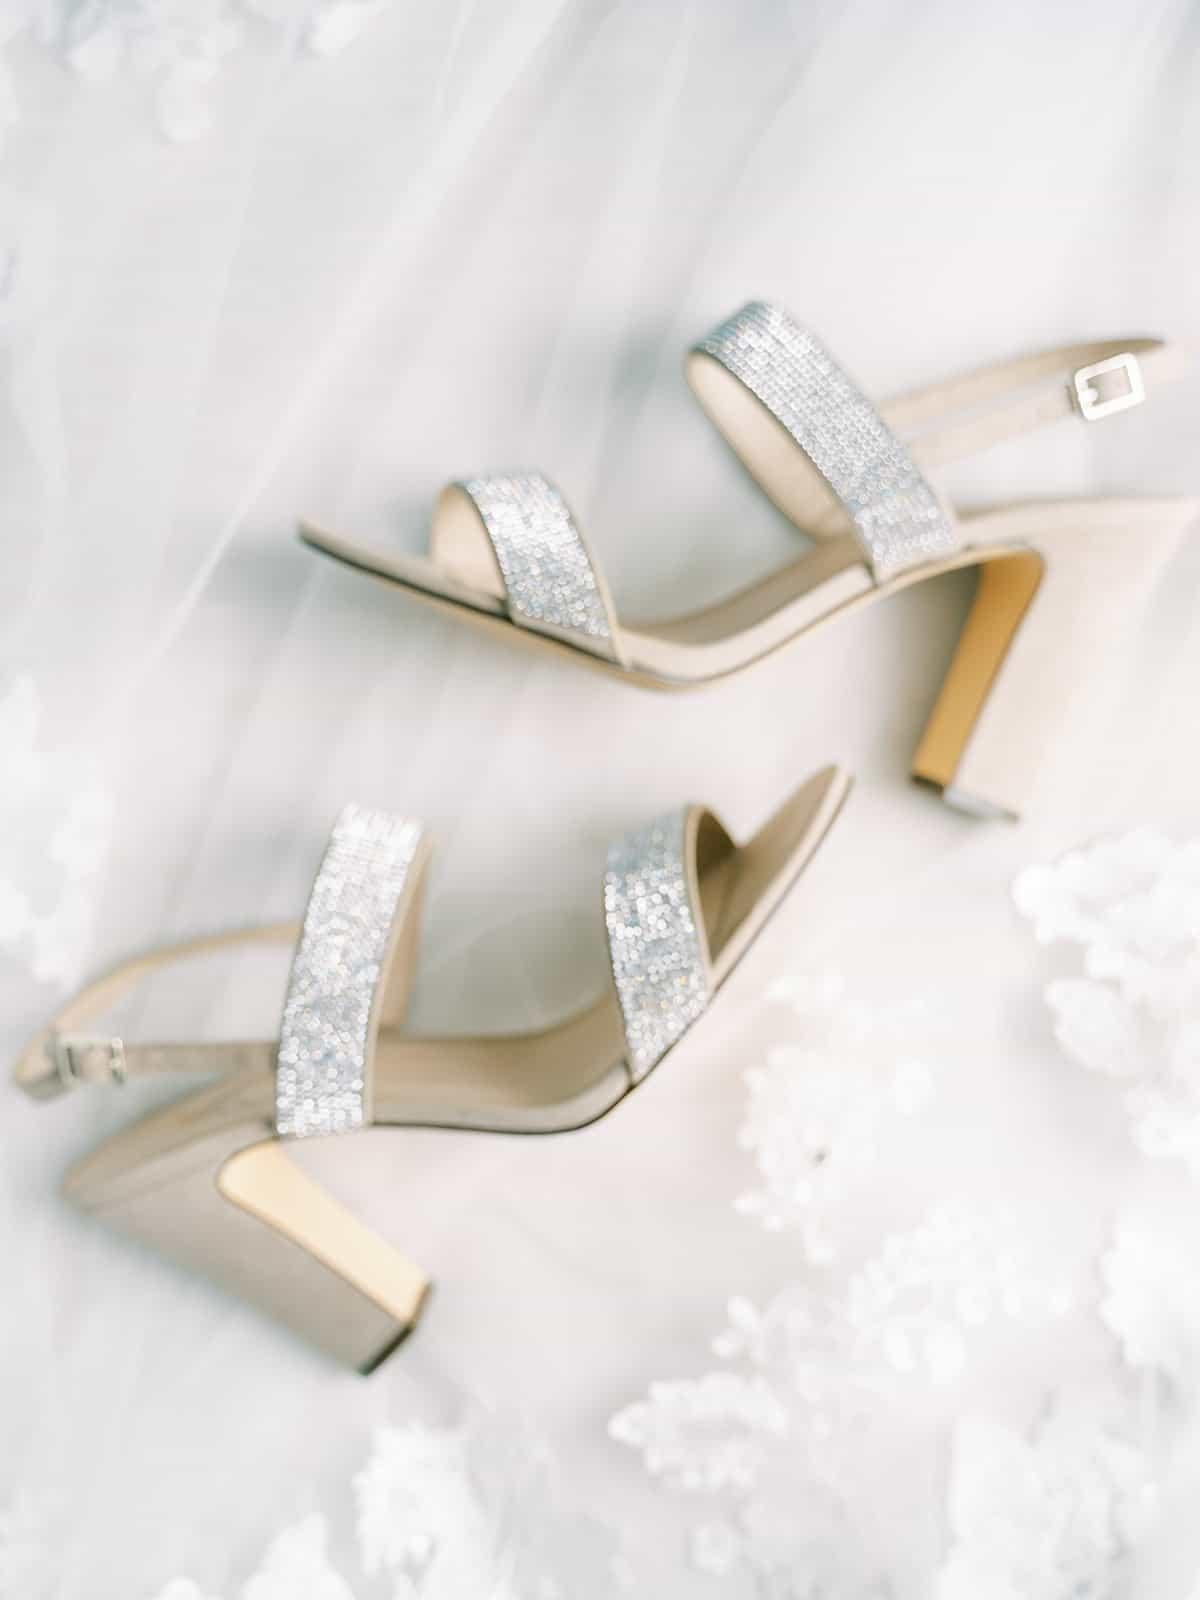 Sparkly silver wedding shoes | Nashville Bride Guide